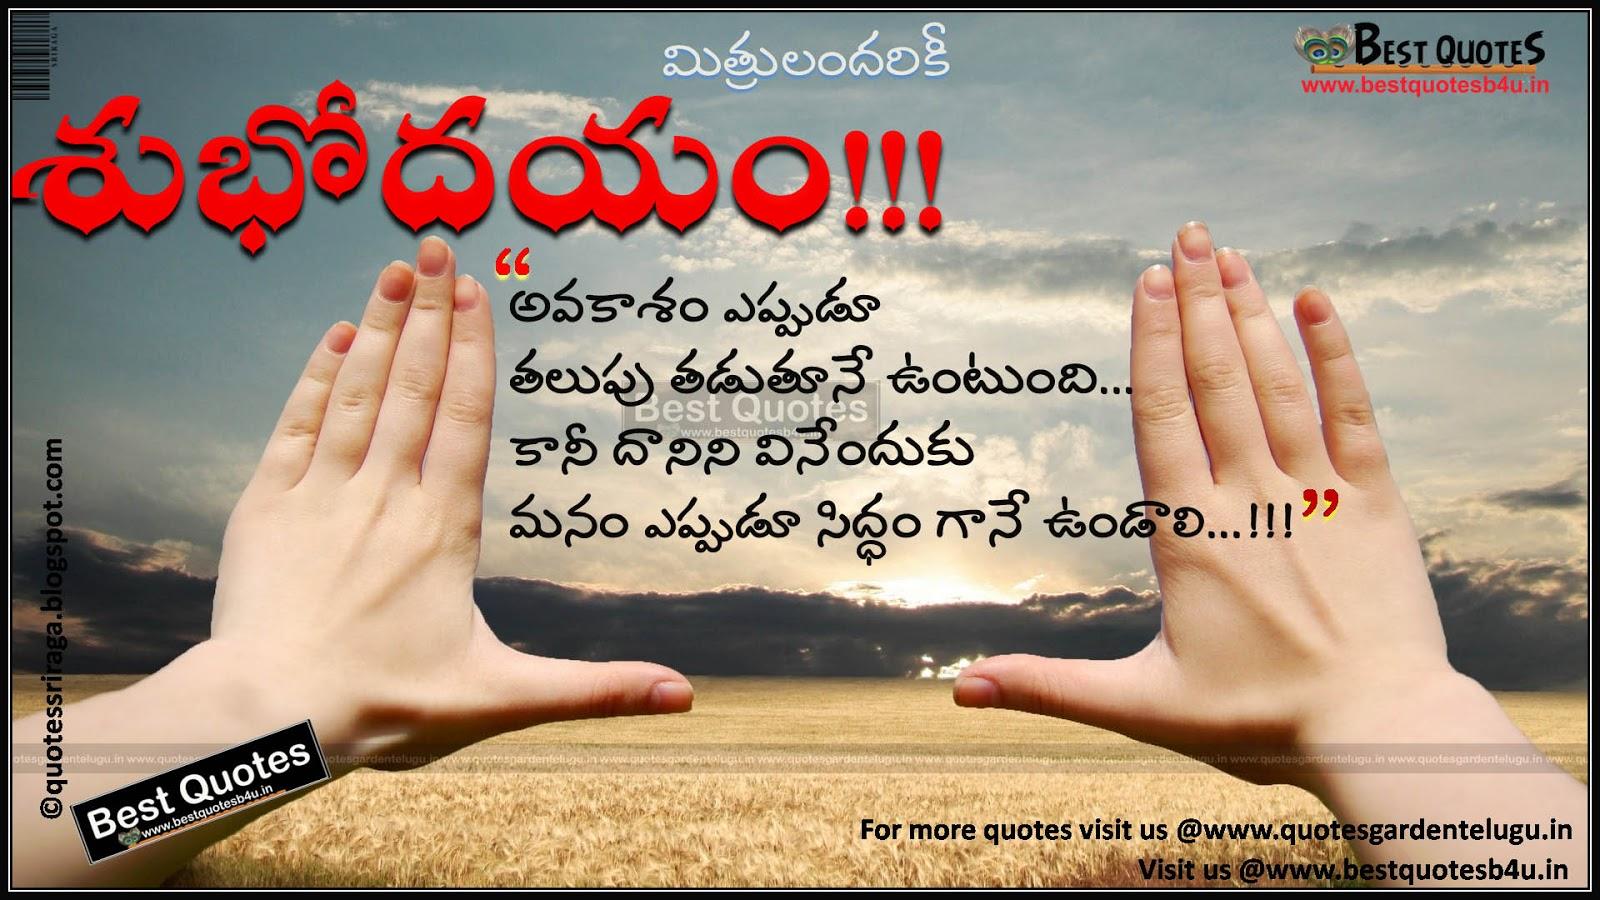 Telugu good morning sms with quotes like share follow telugu good morning sms with quotes kristyandbryce Choice Image